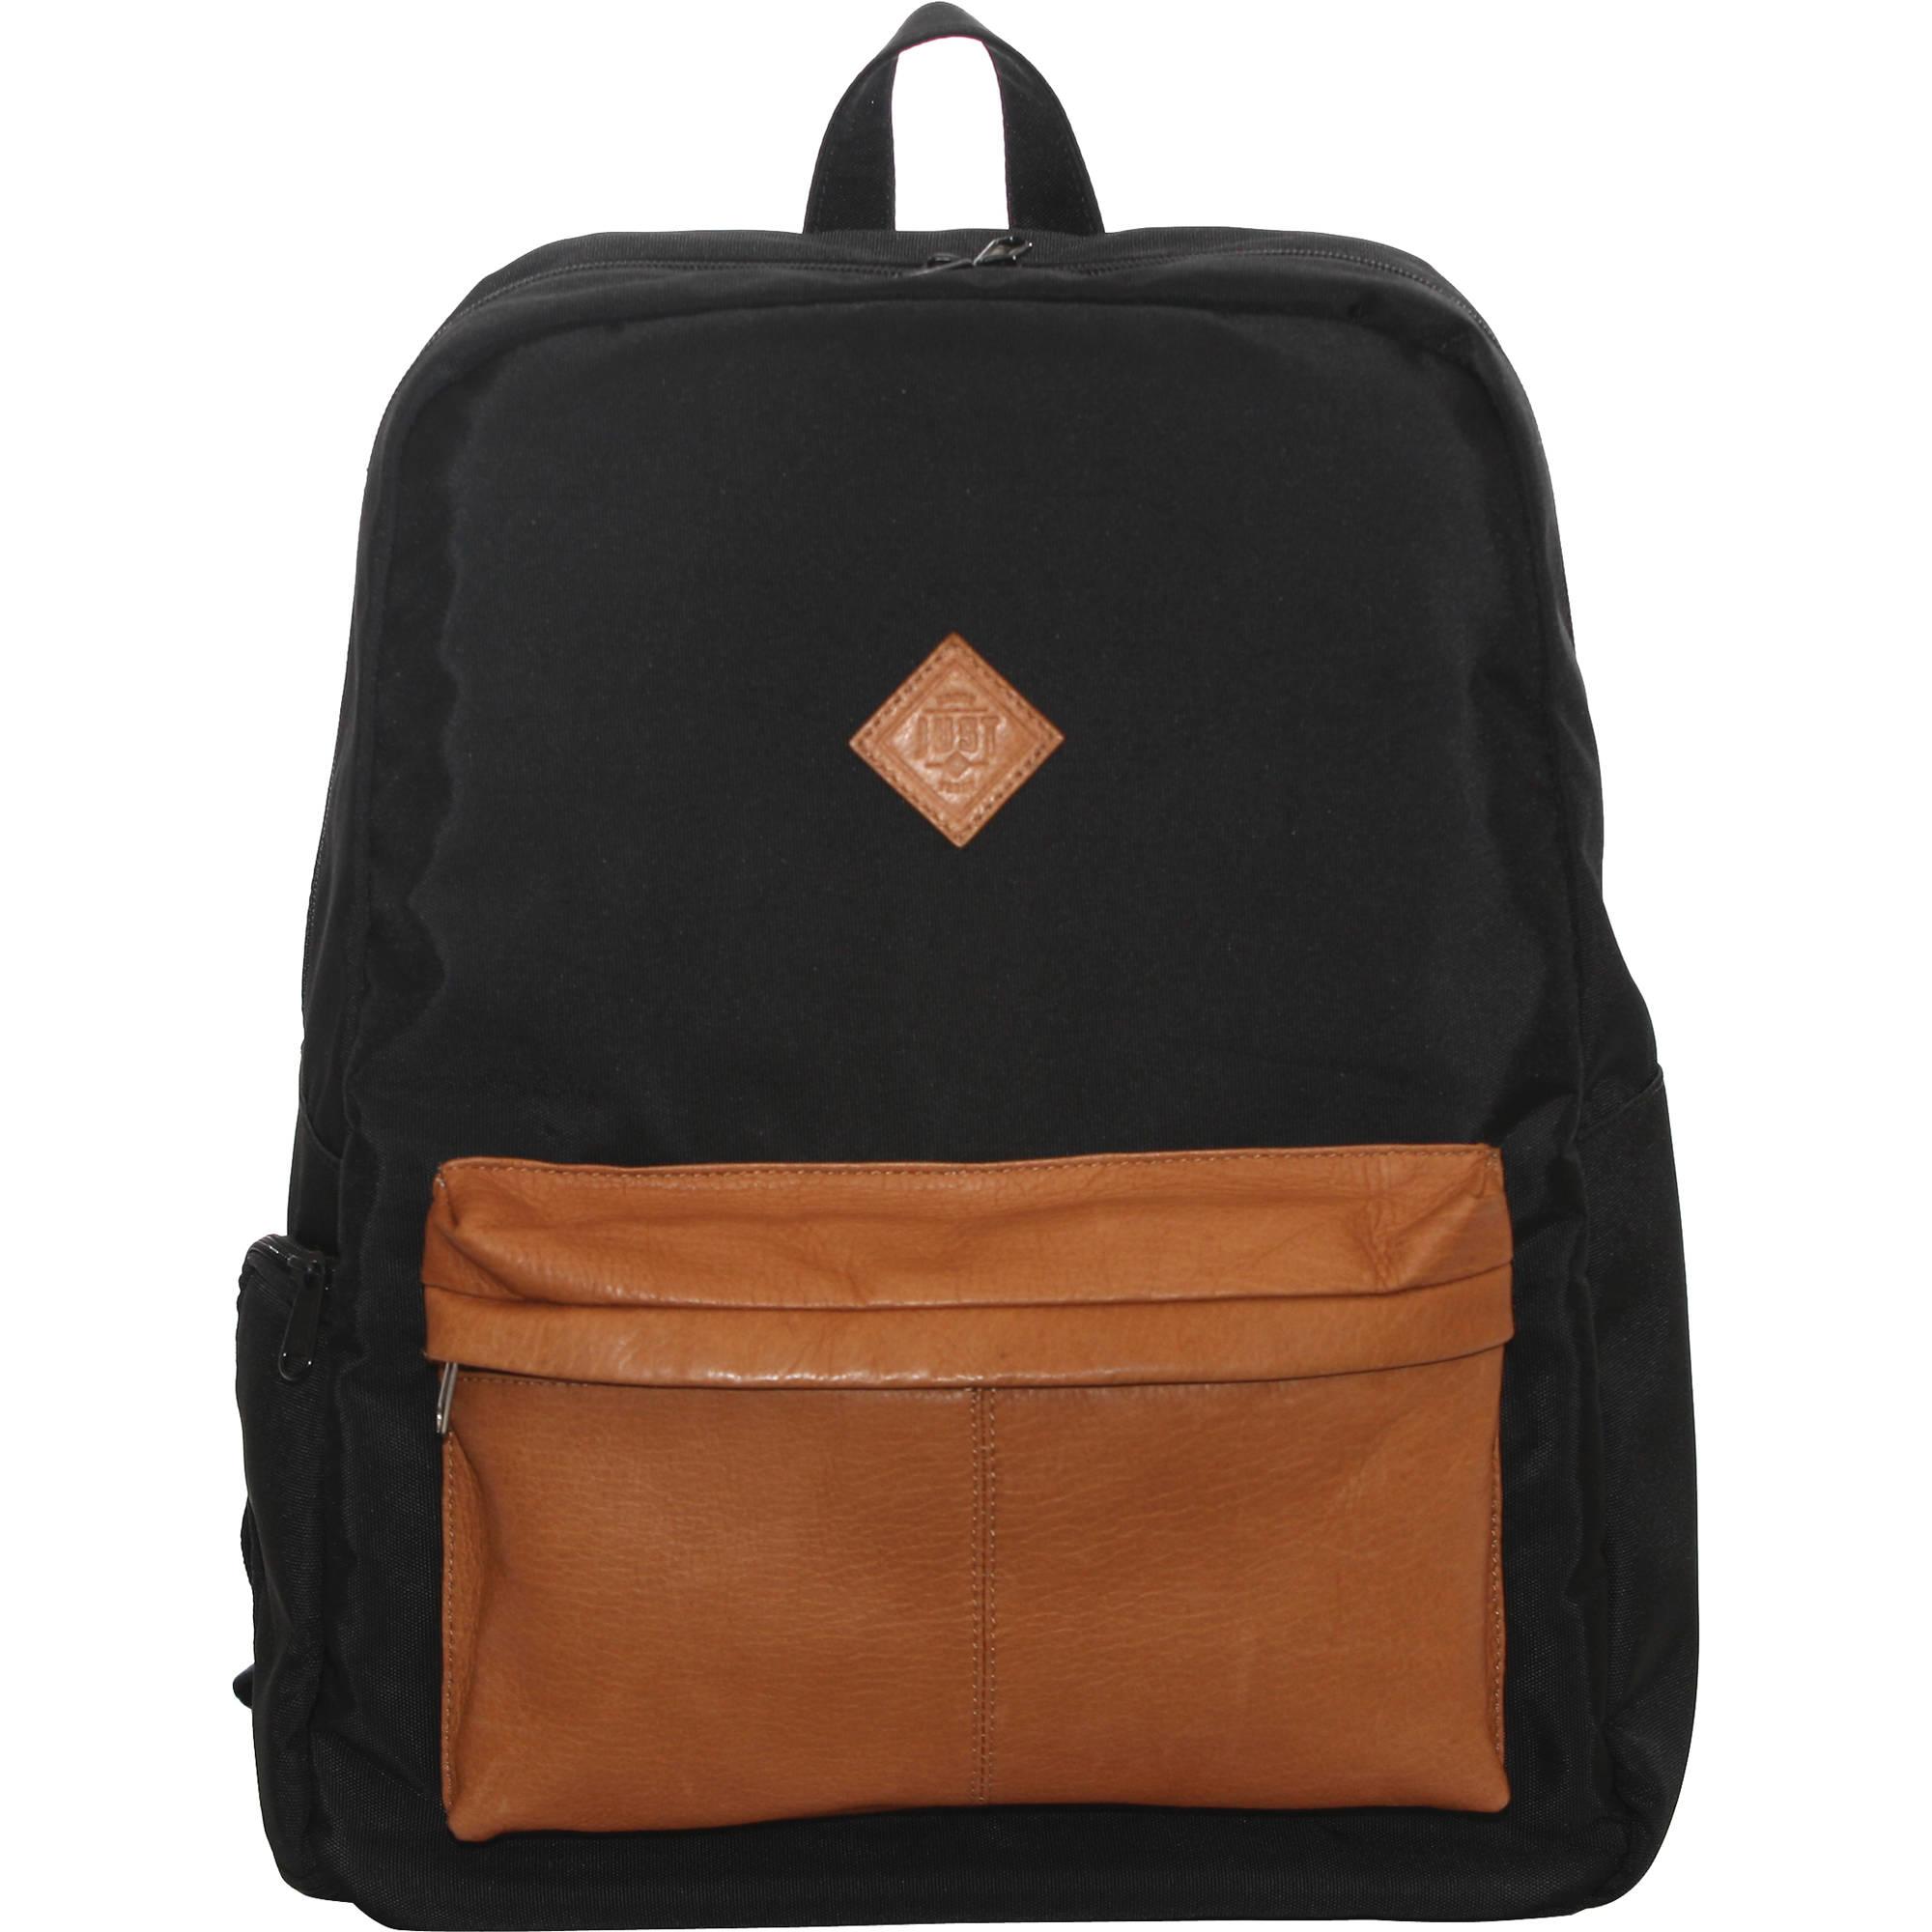 15 Laptop Backpack